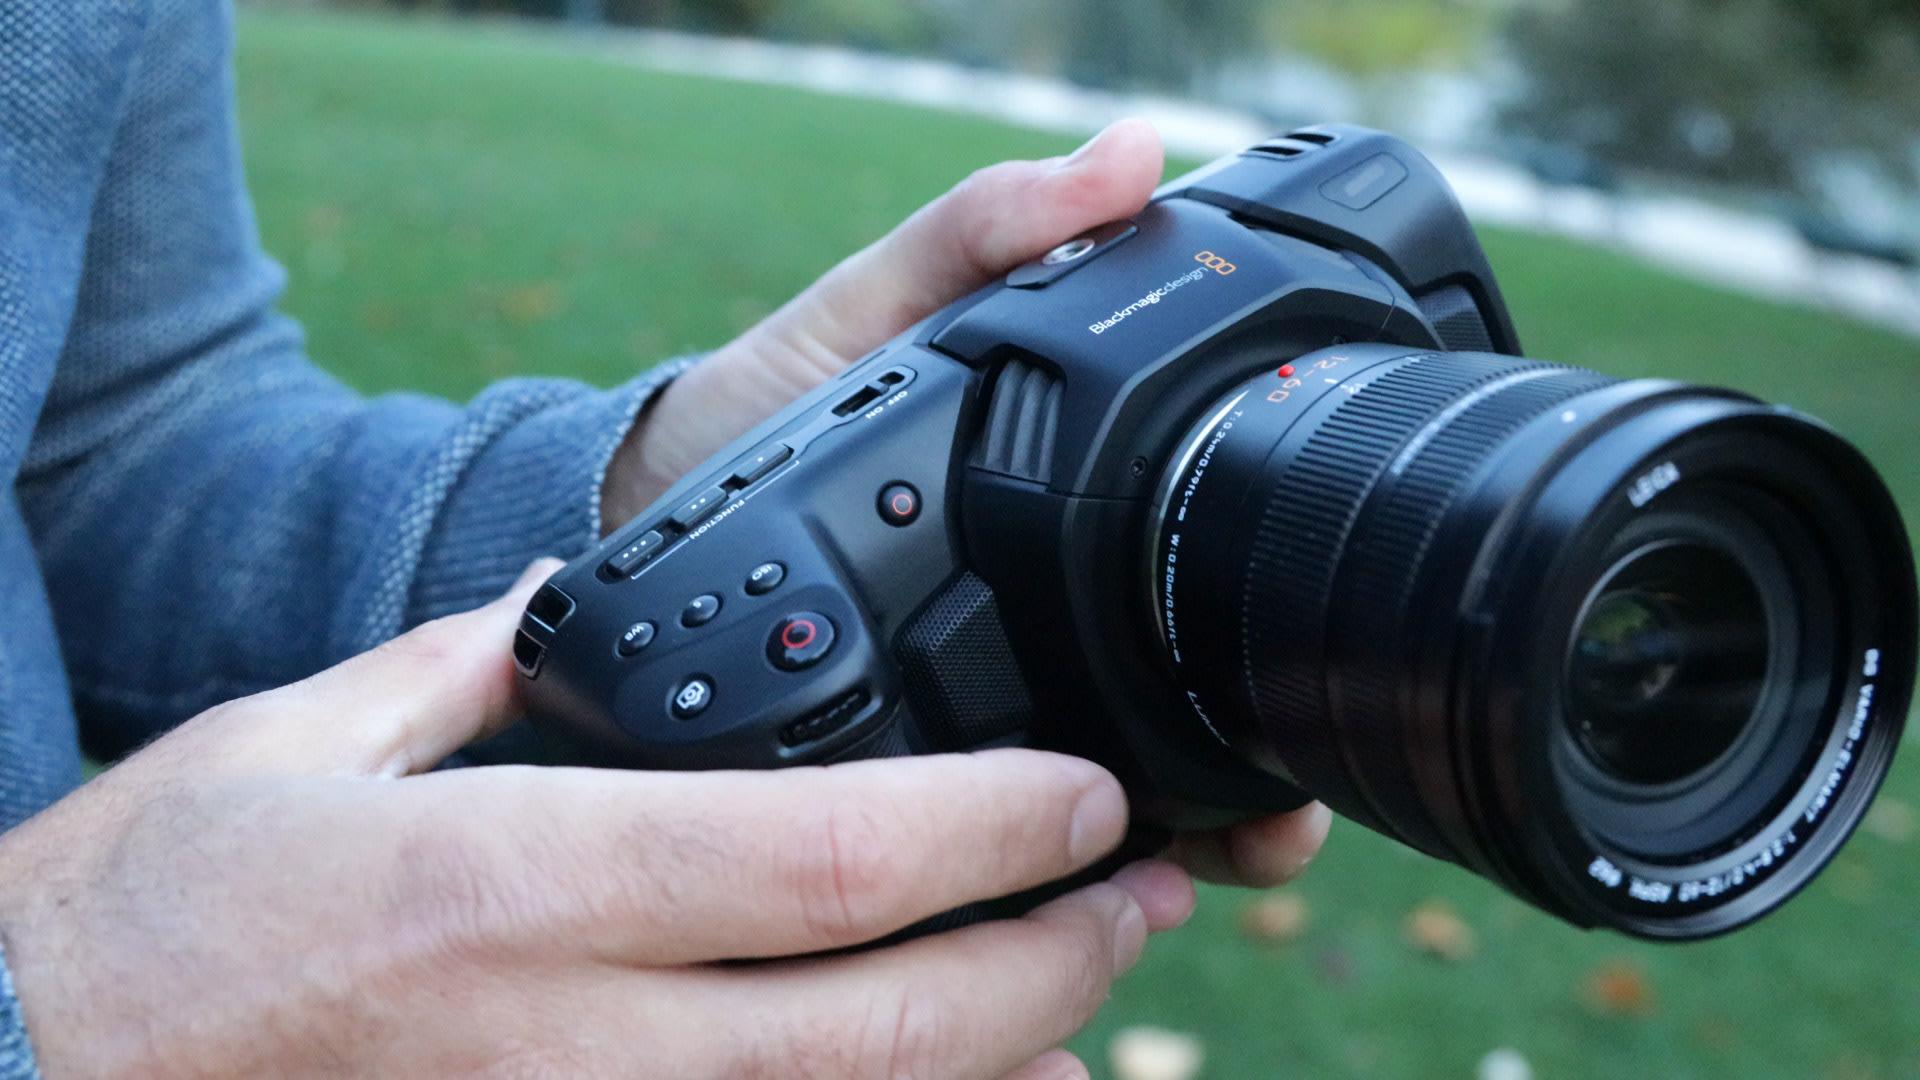 Blackmagic Bmpcc 4k Review A Pint Sized Video Powerhouse Engadget